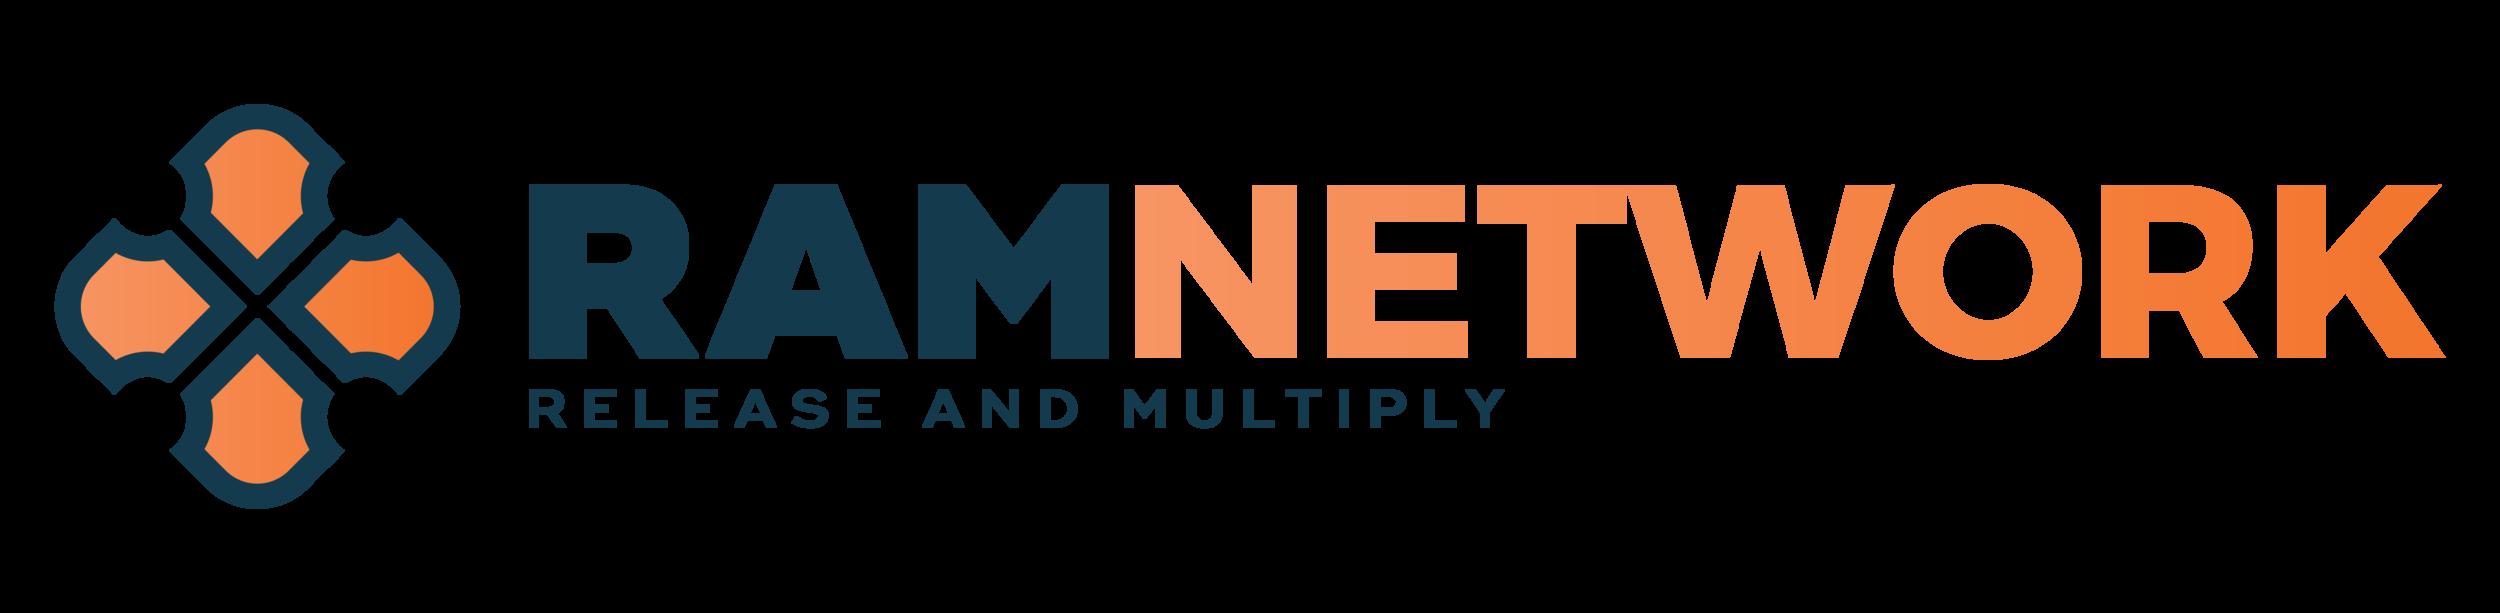 Primary-Logo-Horizontal-Gradient.png